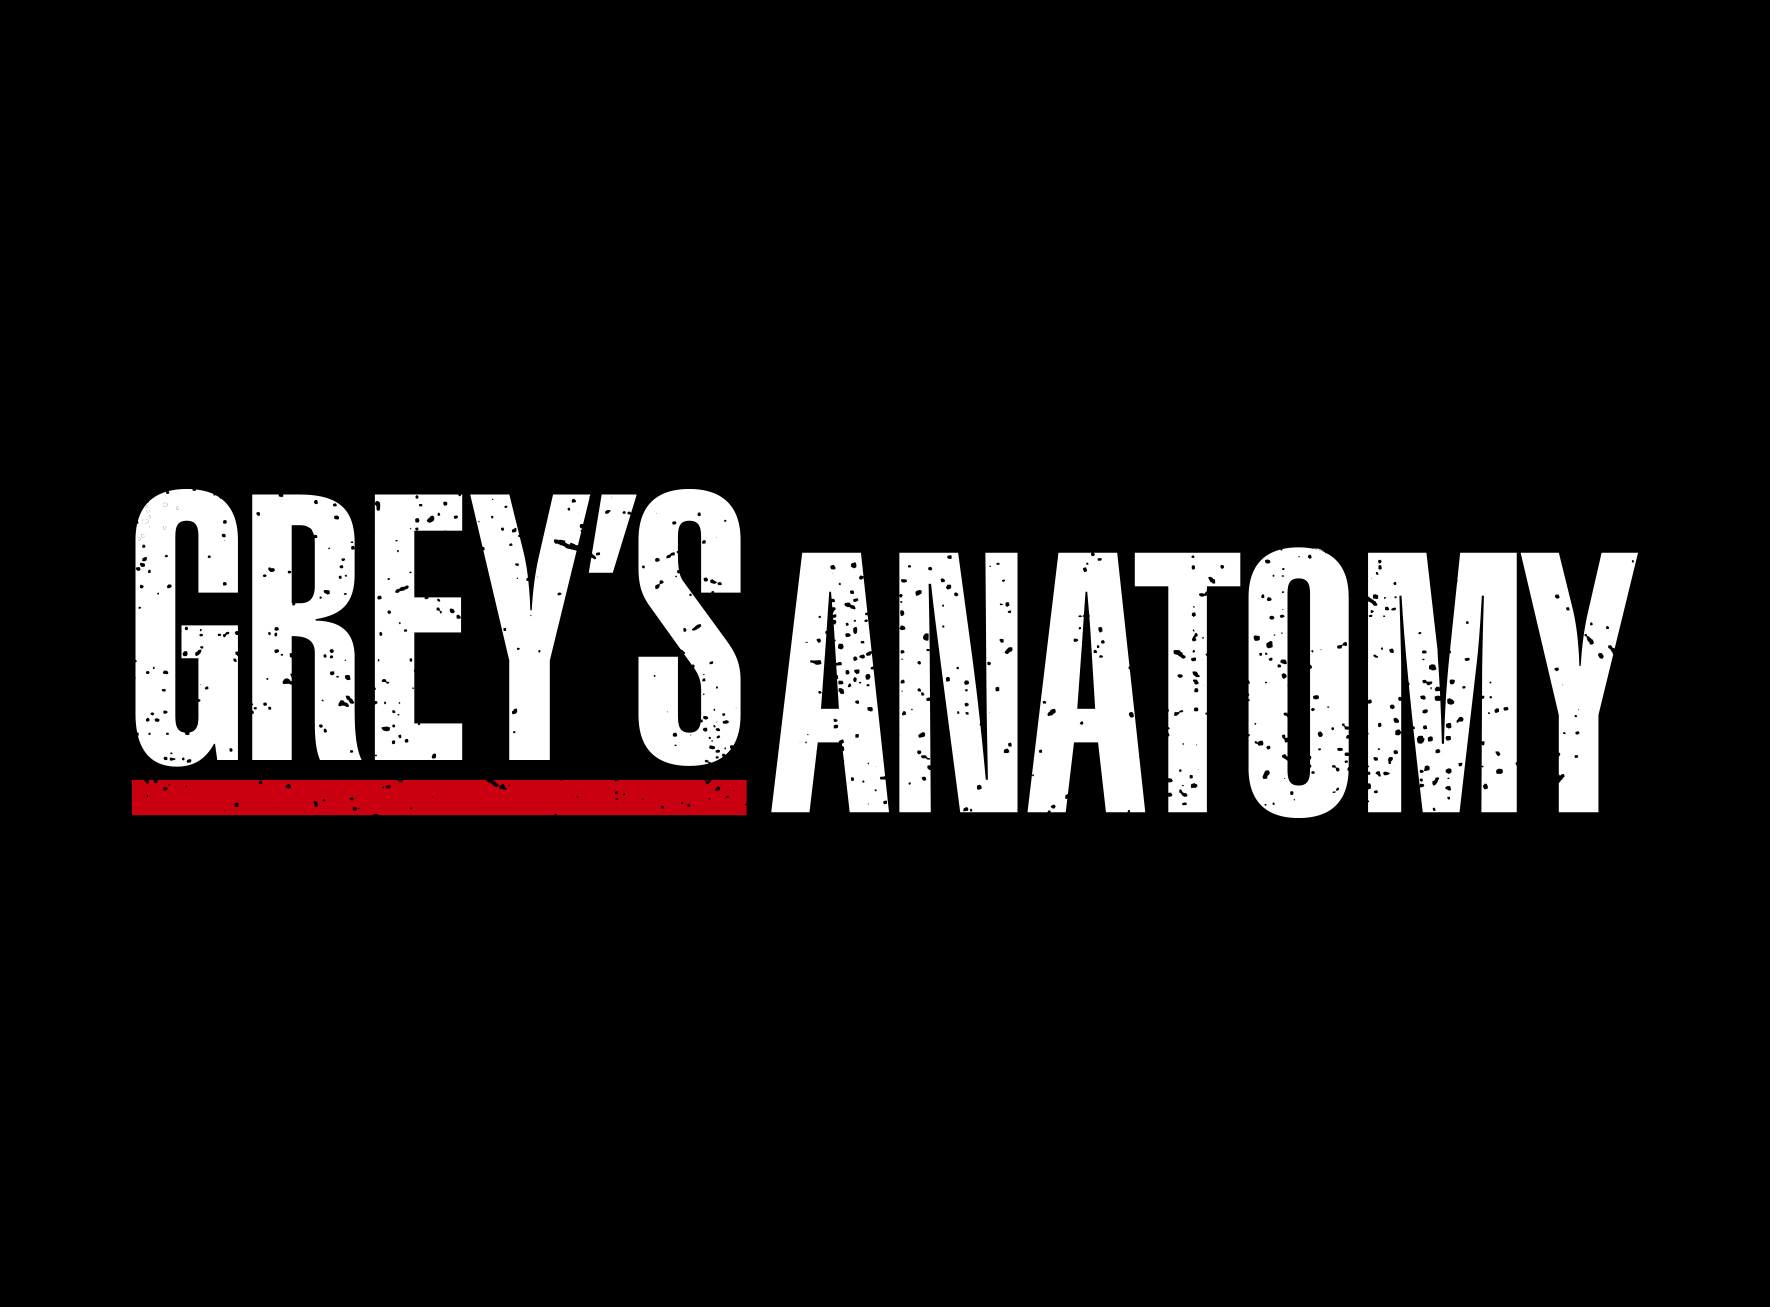 La ABC ricorda - SPOILER - dopo la morte in Grey's Anatomy ...